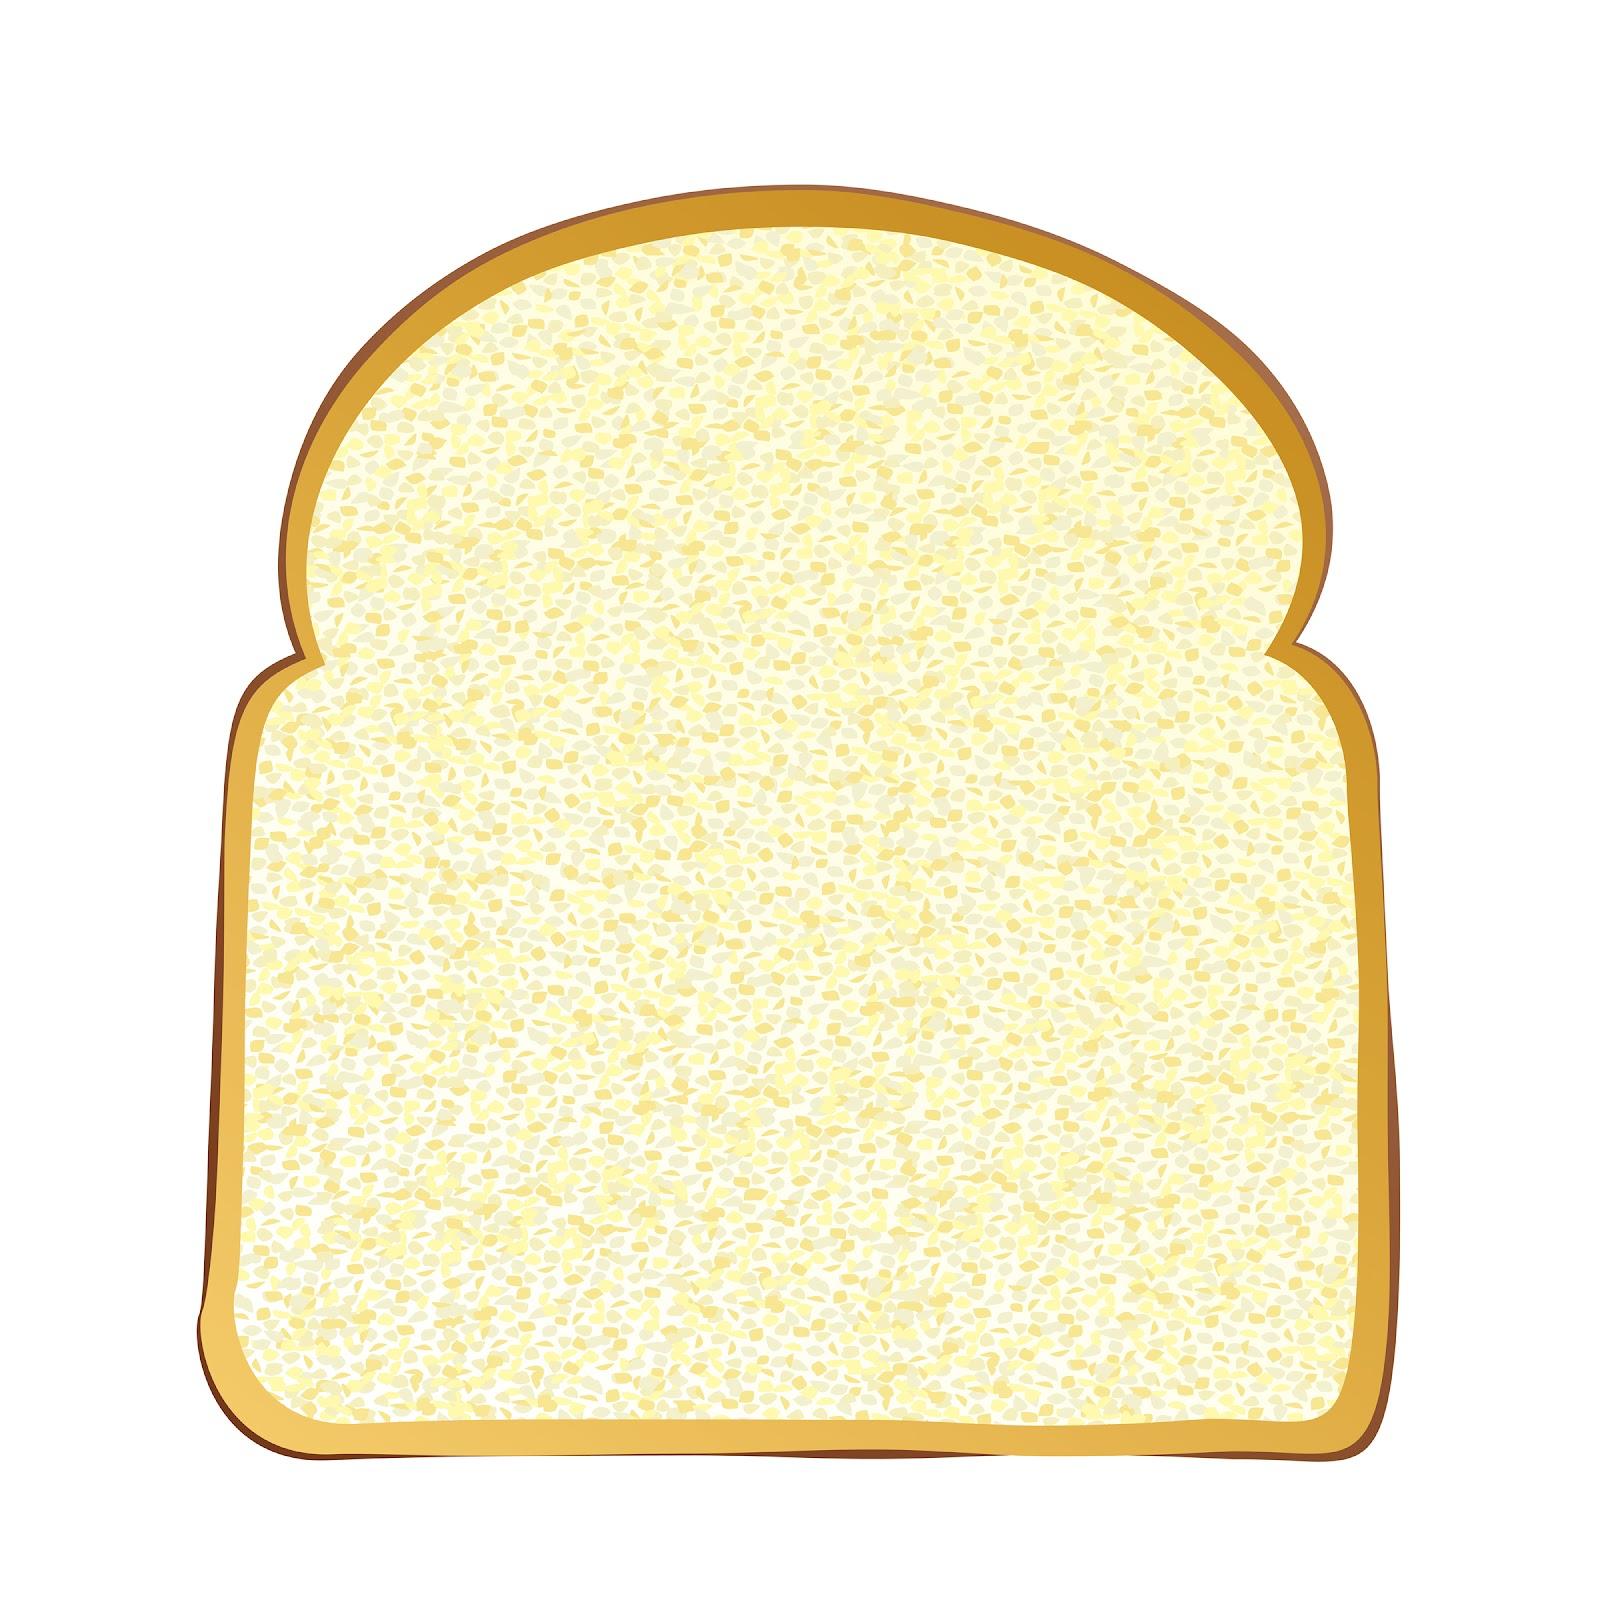 Toast clipart slice bread Bread knife slice template knife